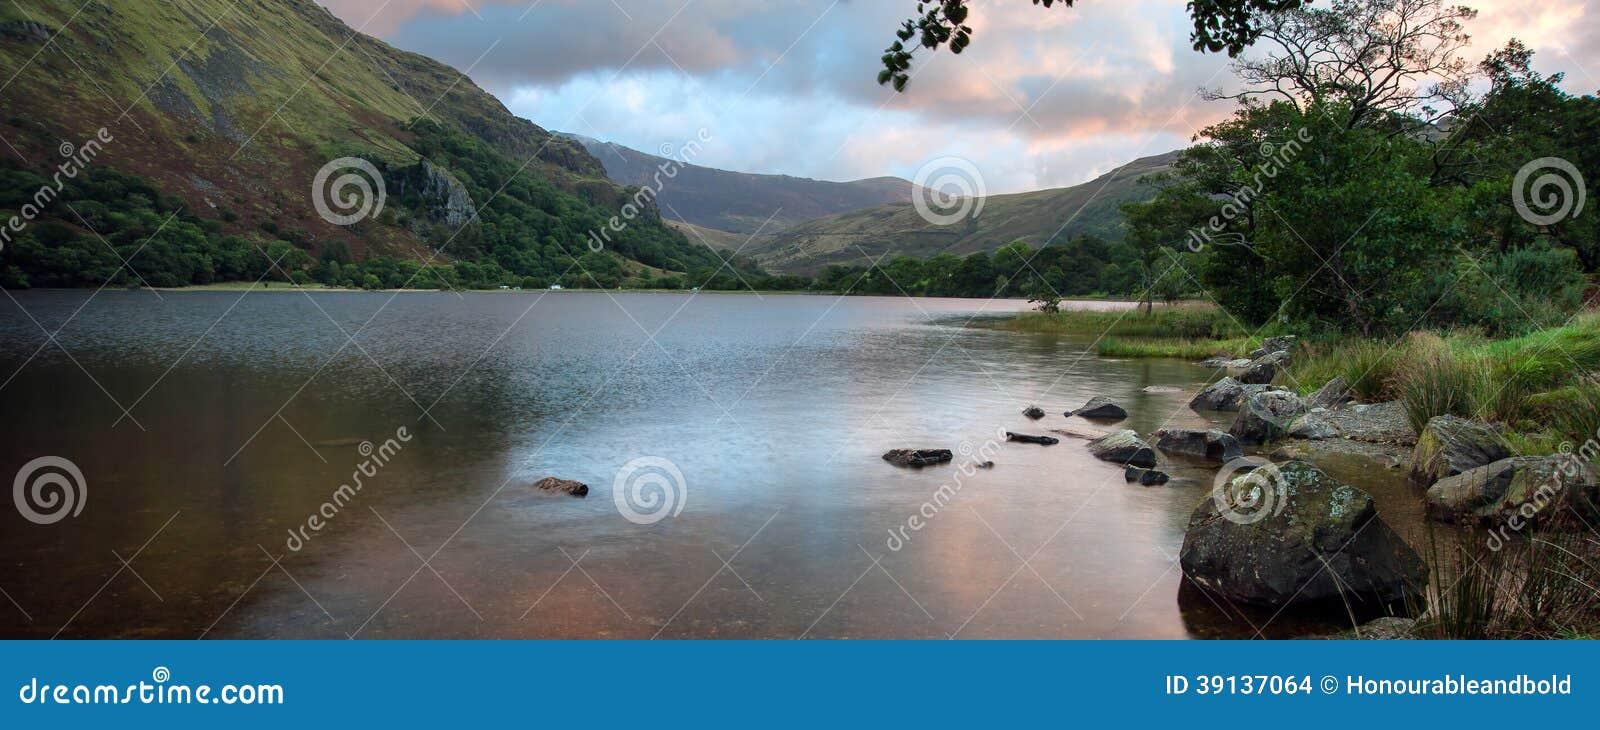 Panorama landscape sunrise over lake in mountains